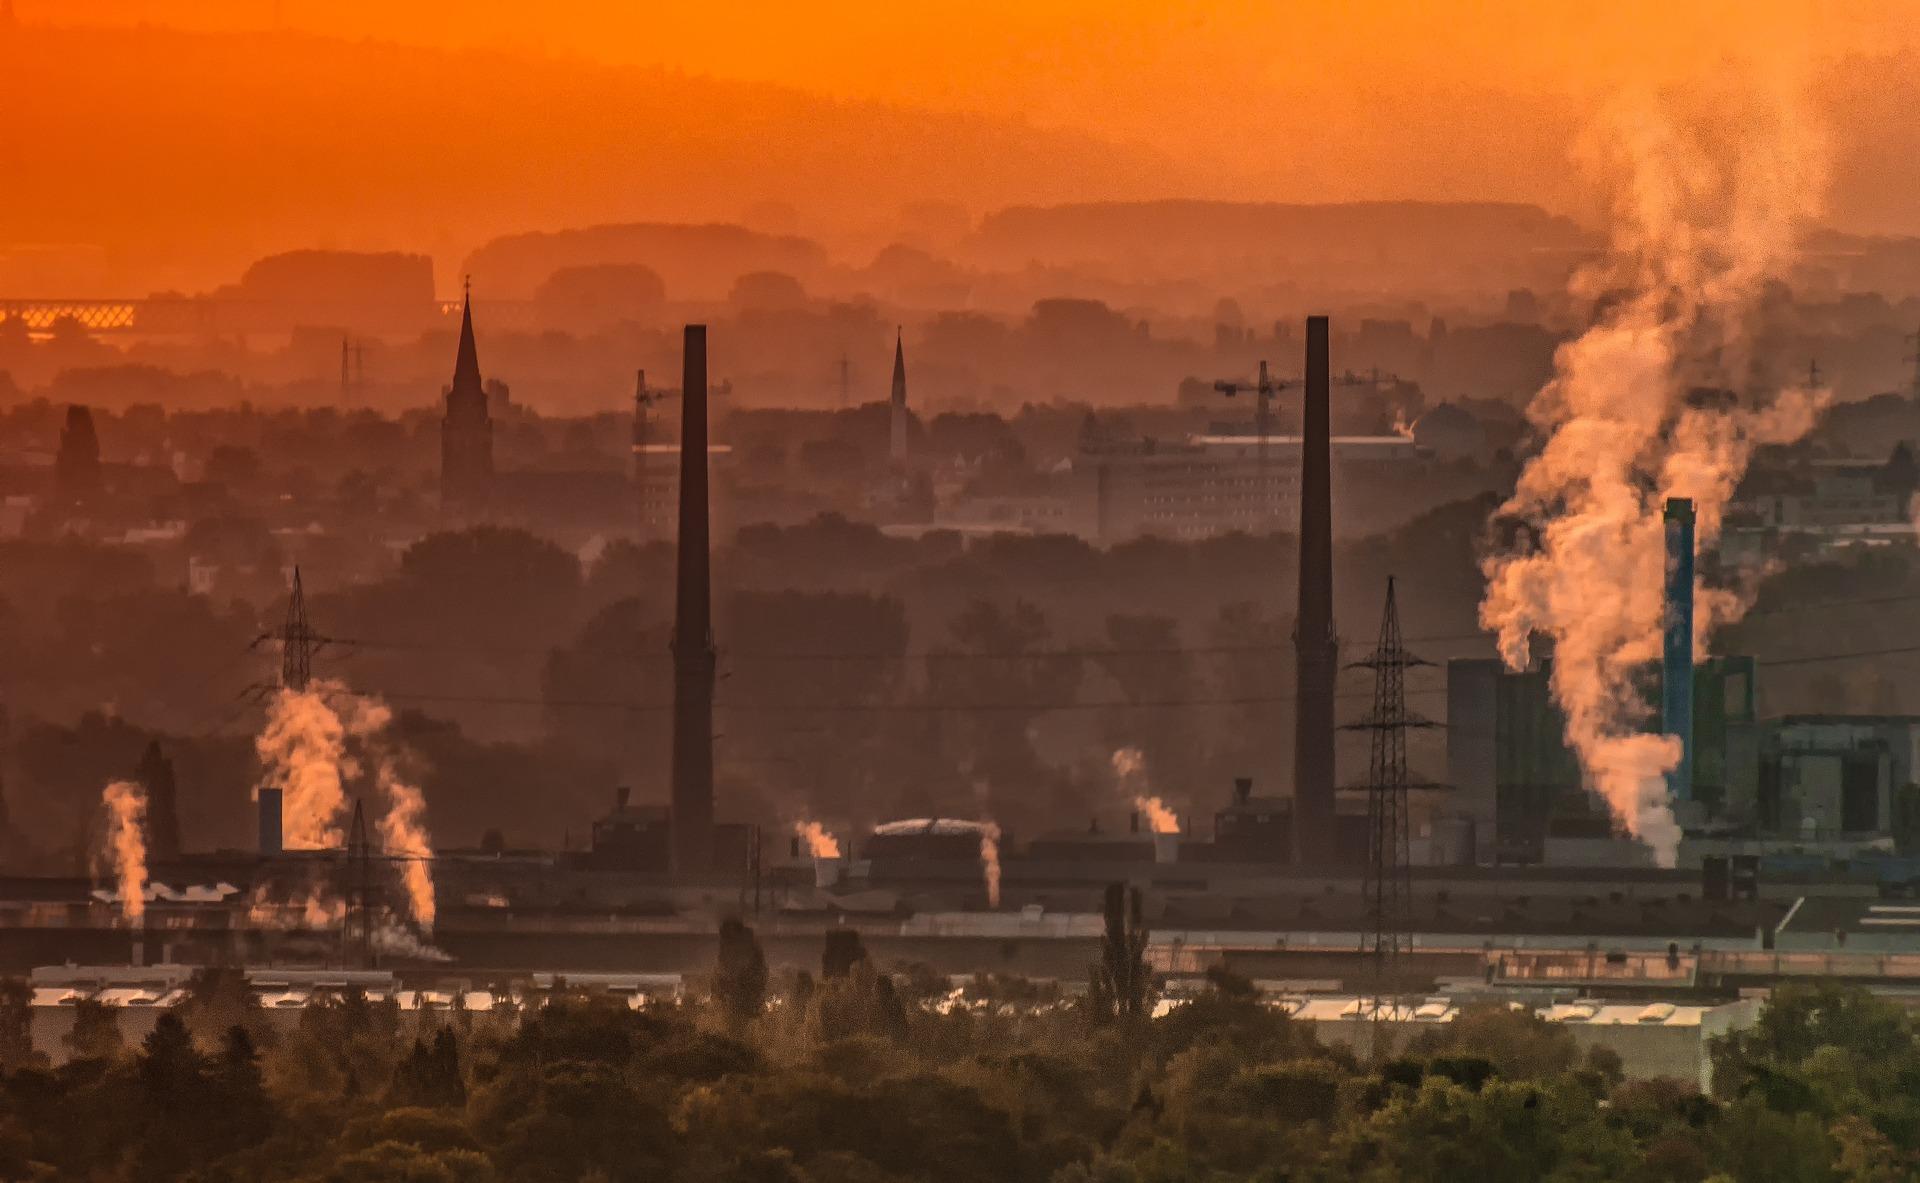 The Predicament called Air Pollution